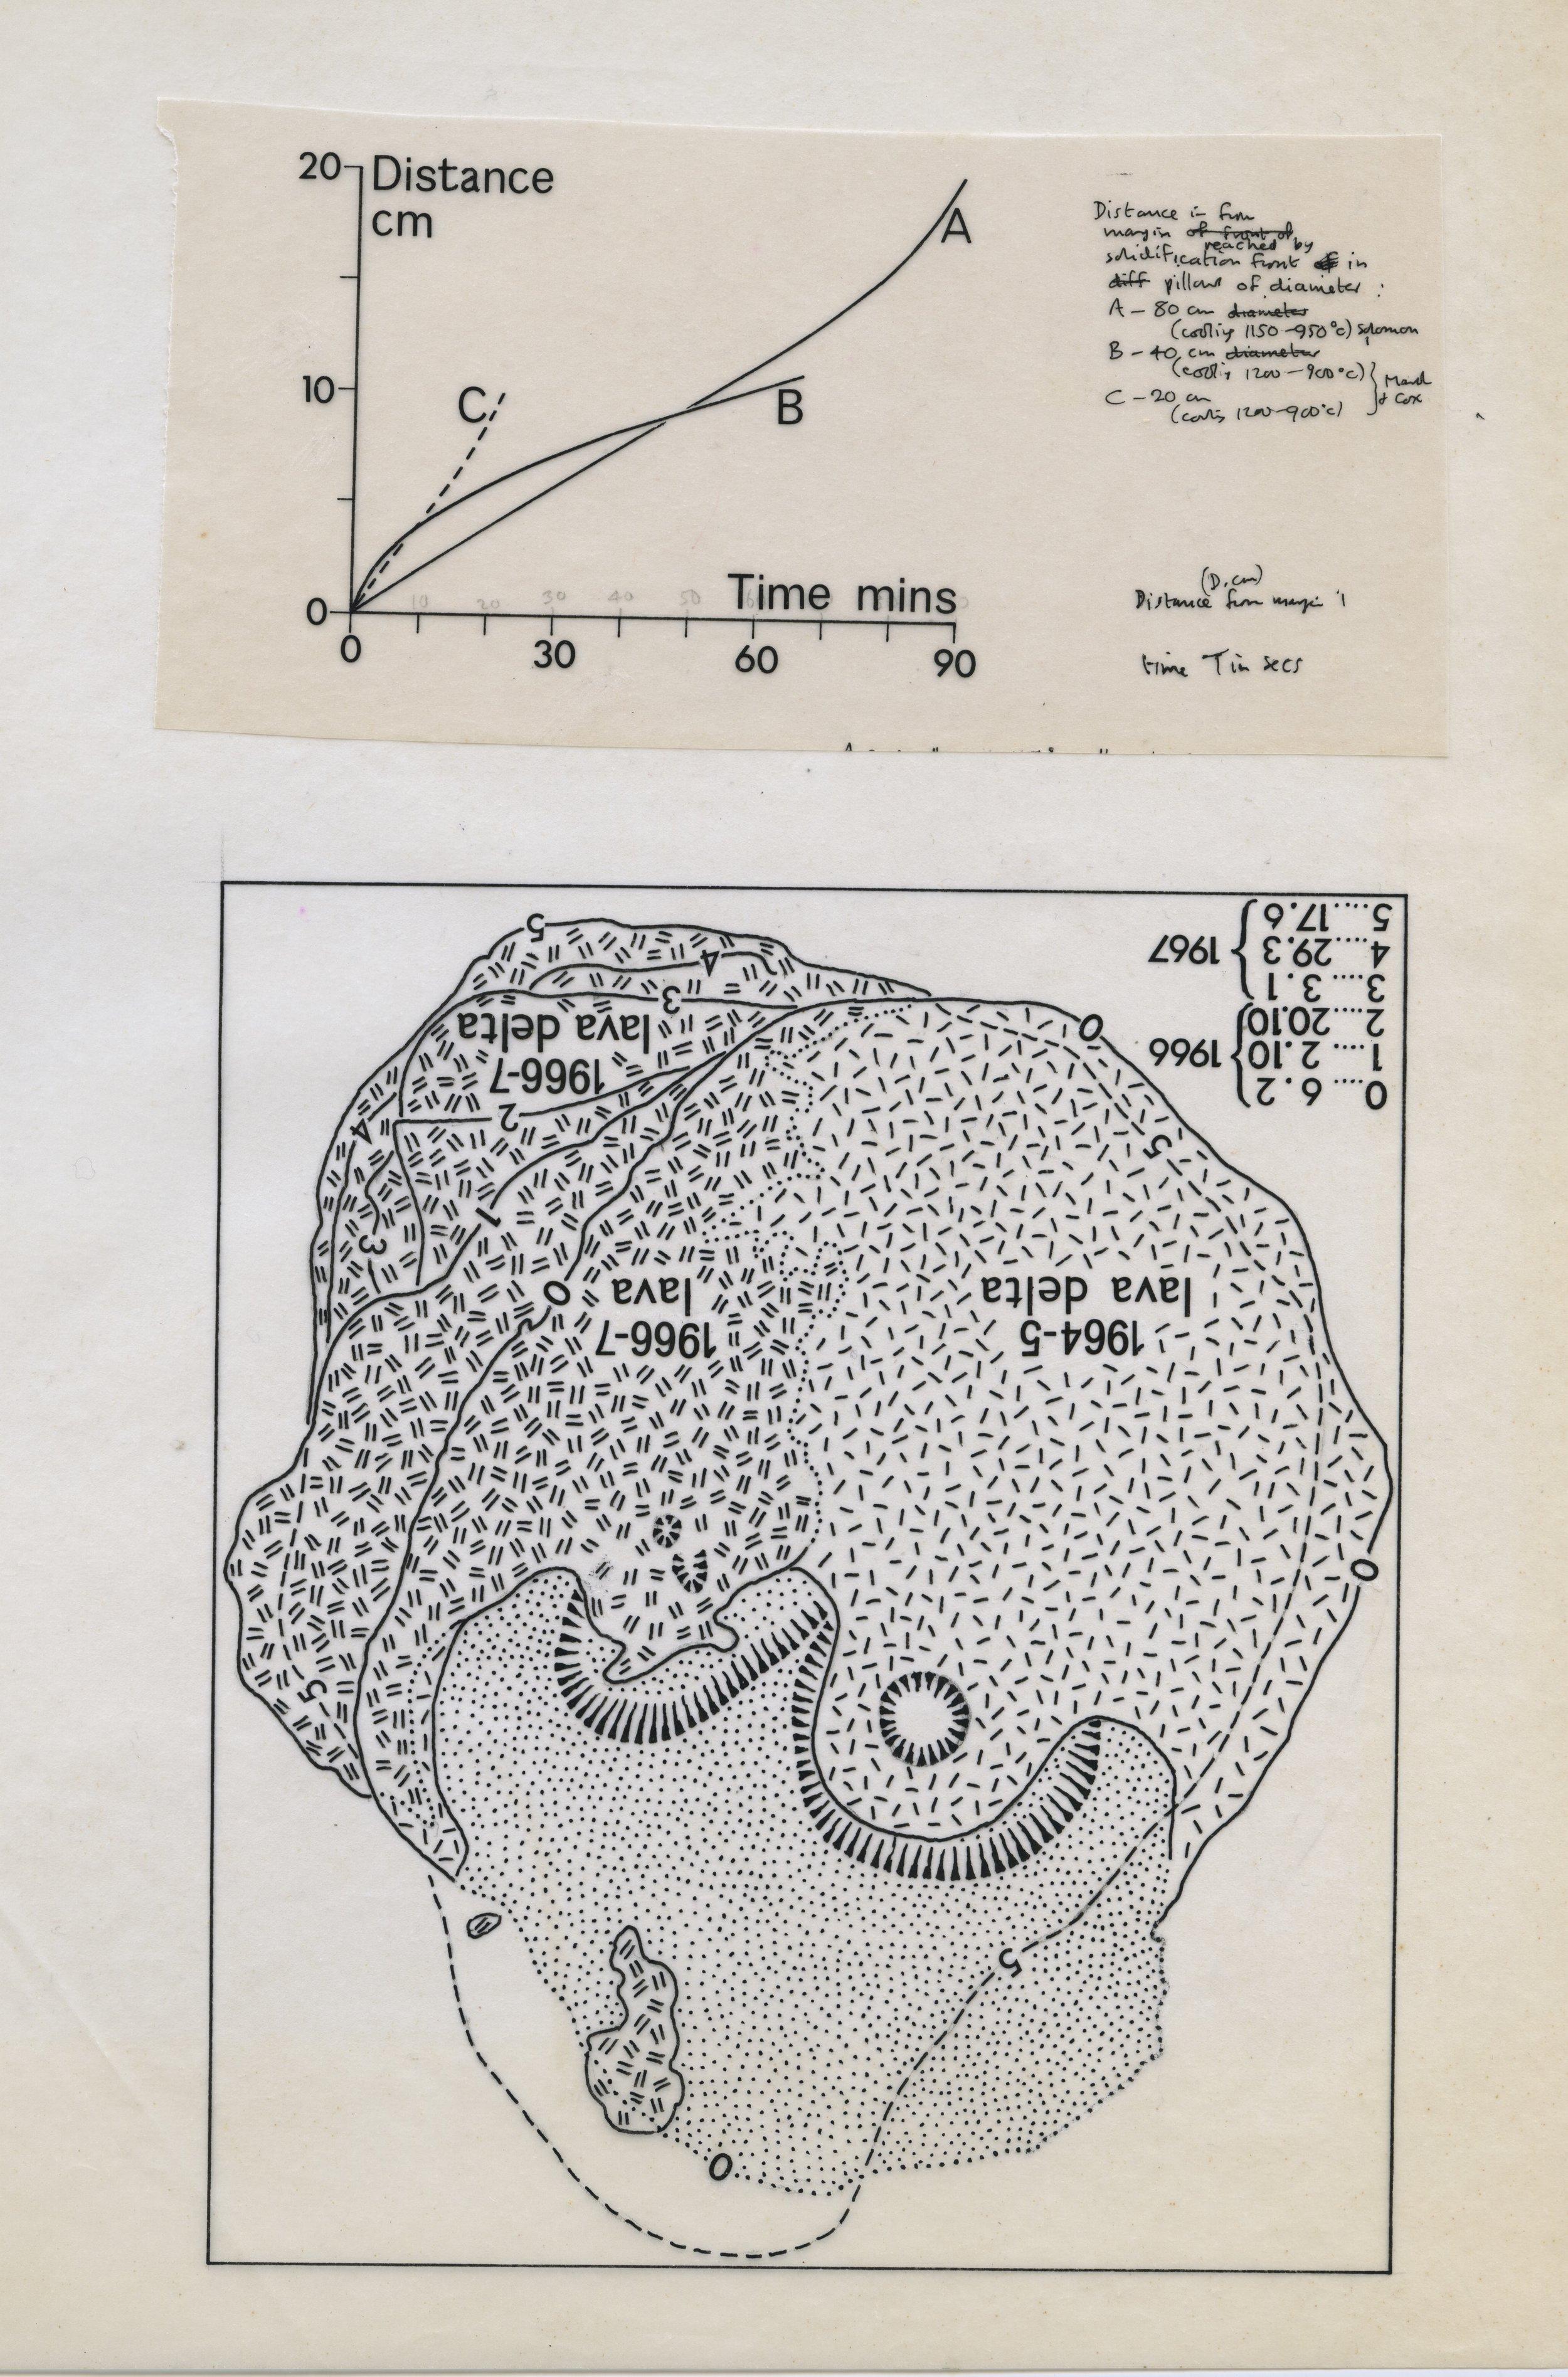 chp 8 subaqueous stursey diagram.jpeg